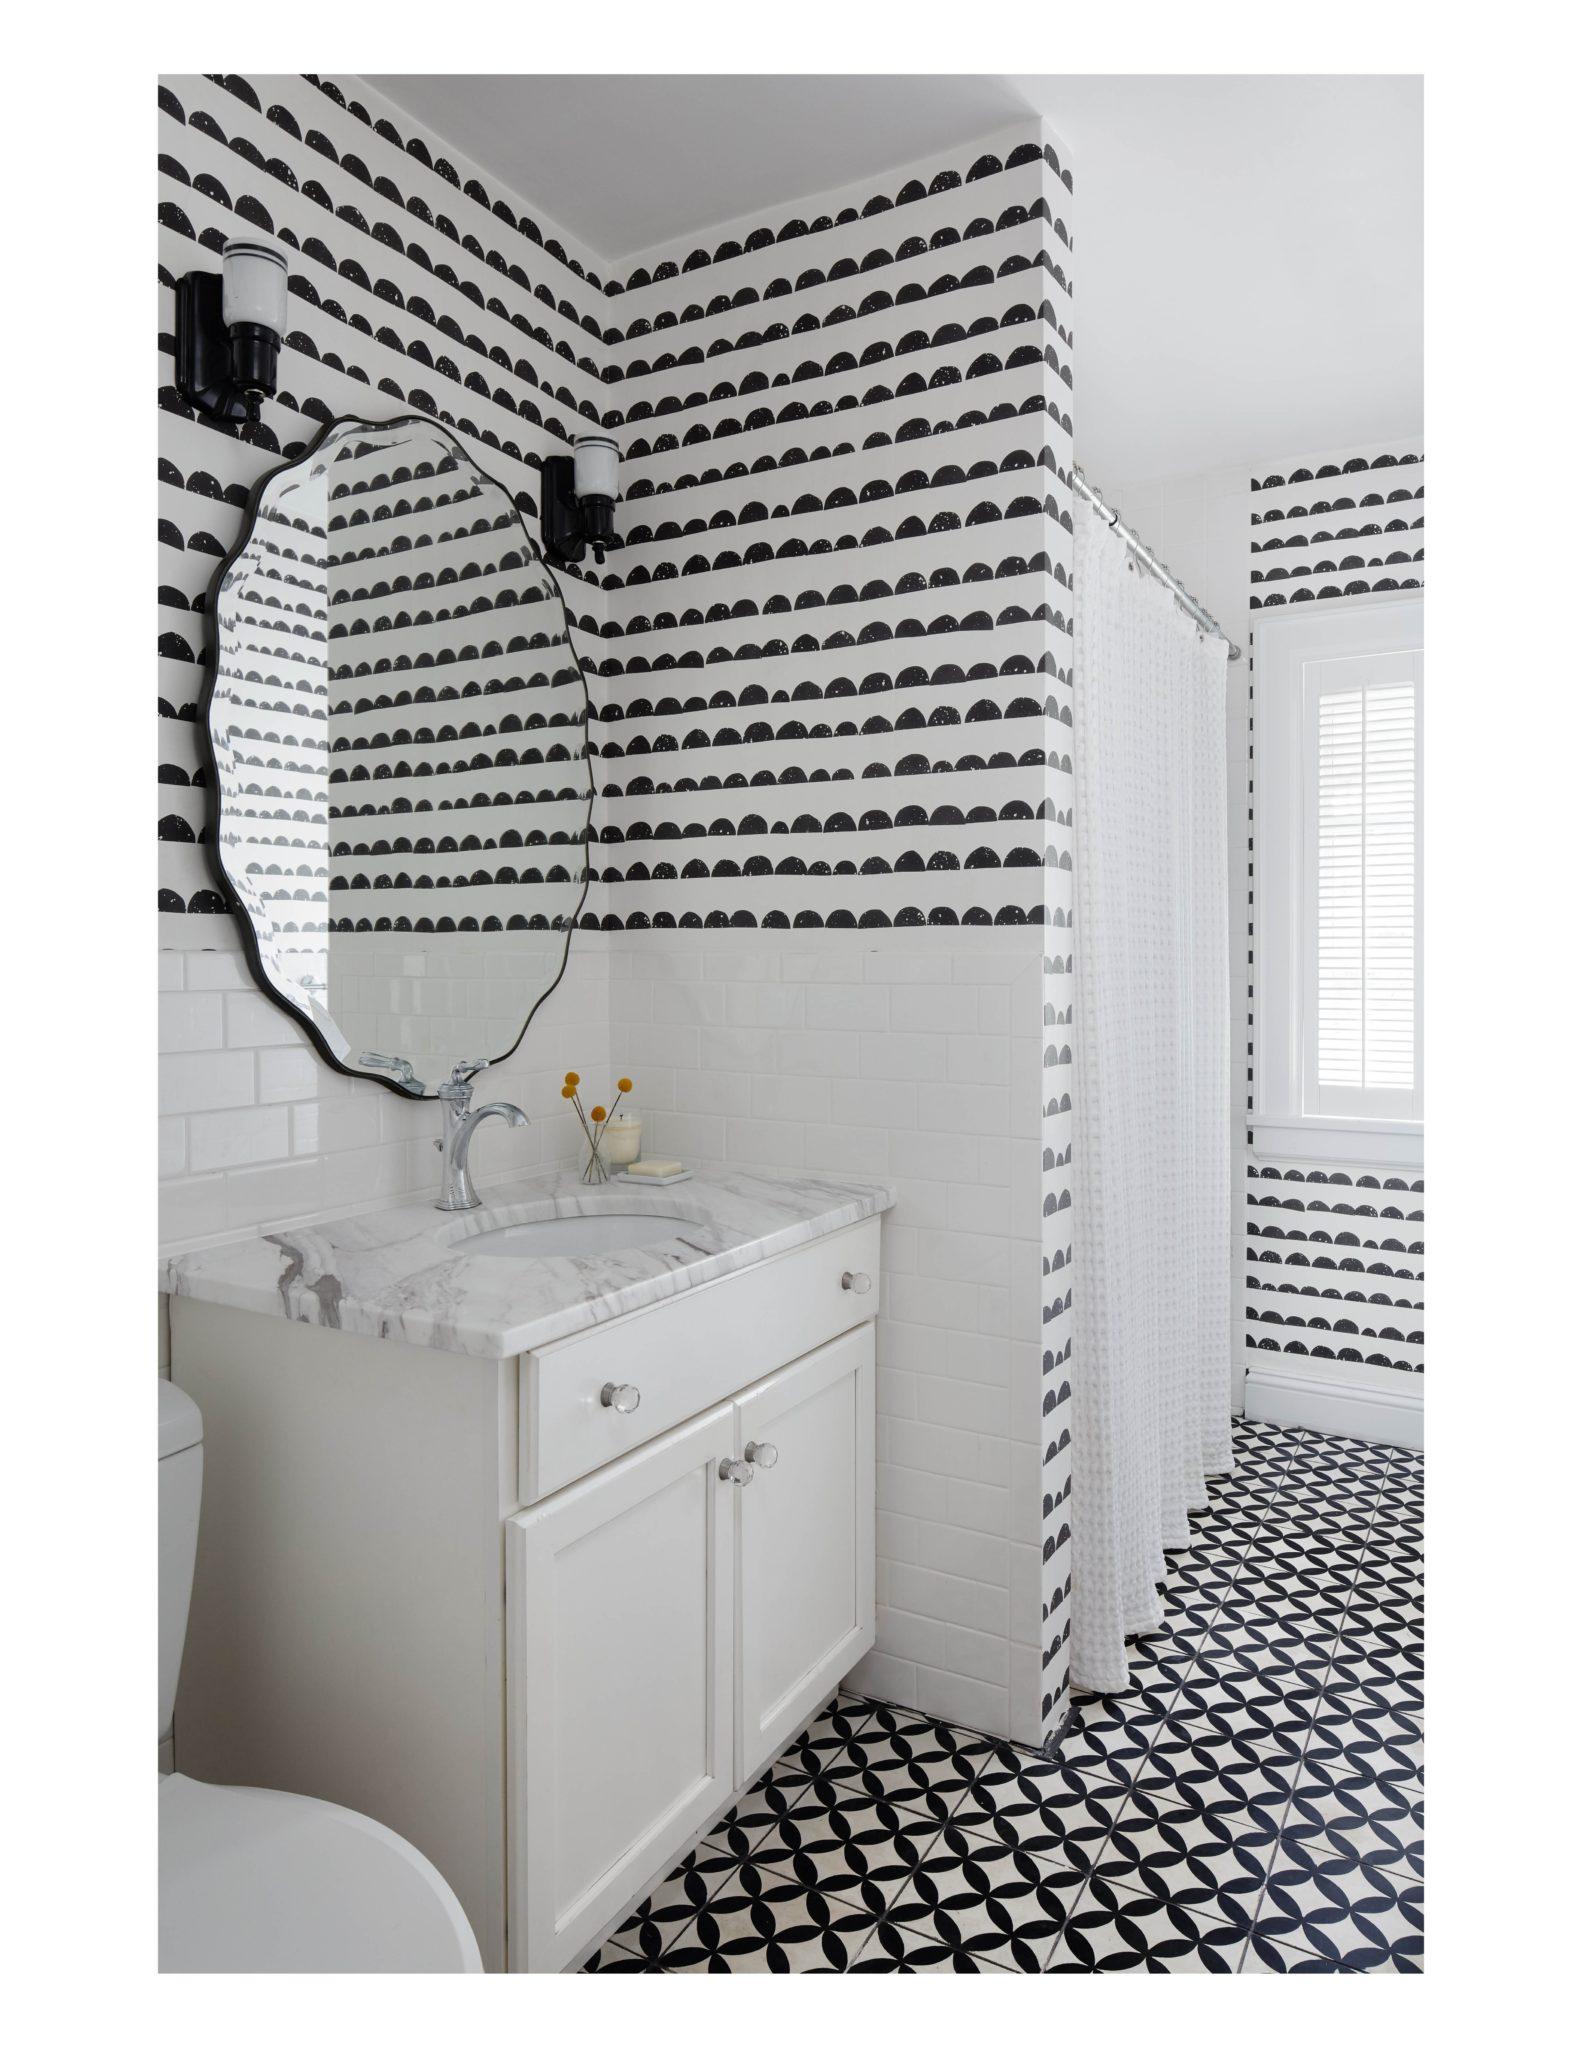 Wilmette black and white kids' bedroom by Jen Talbot Design